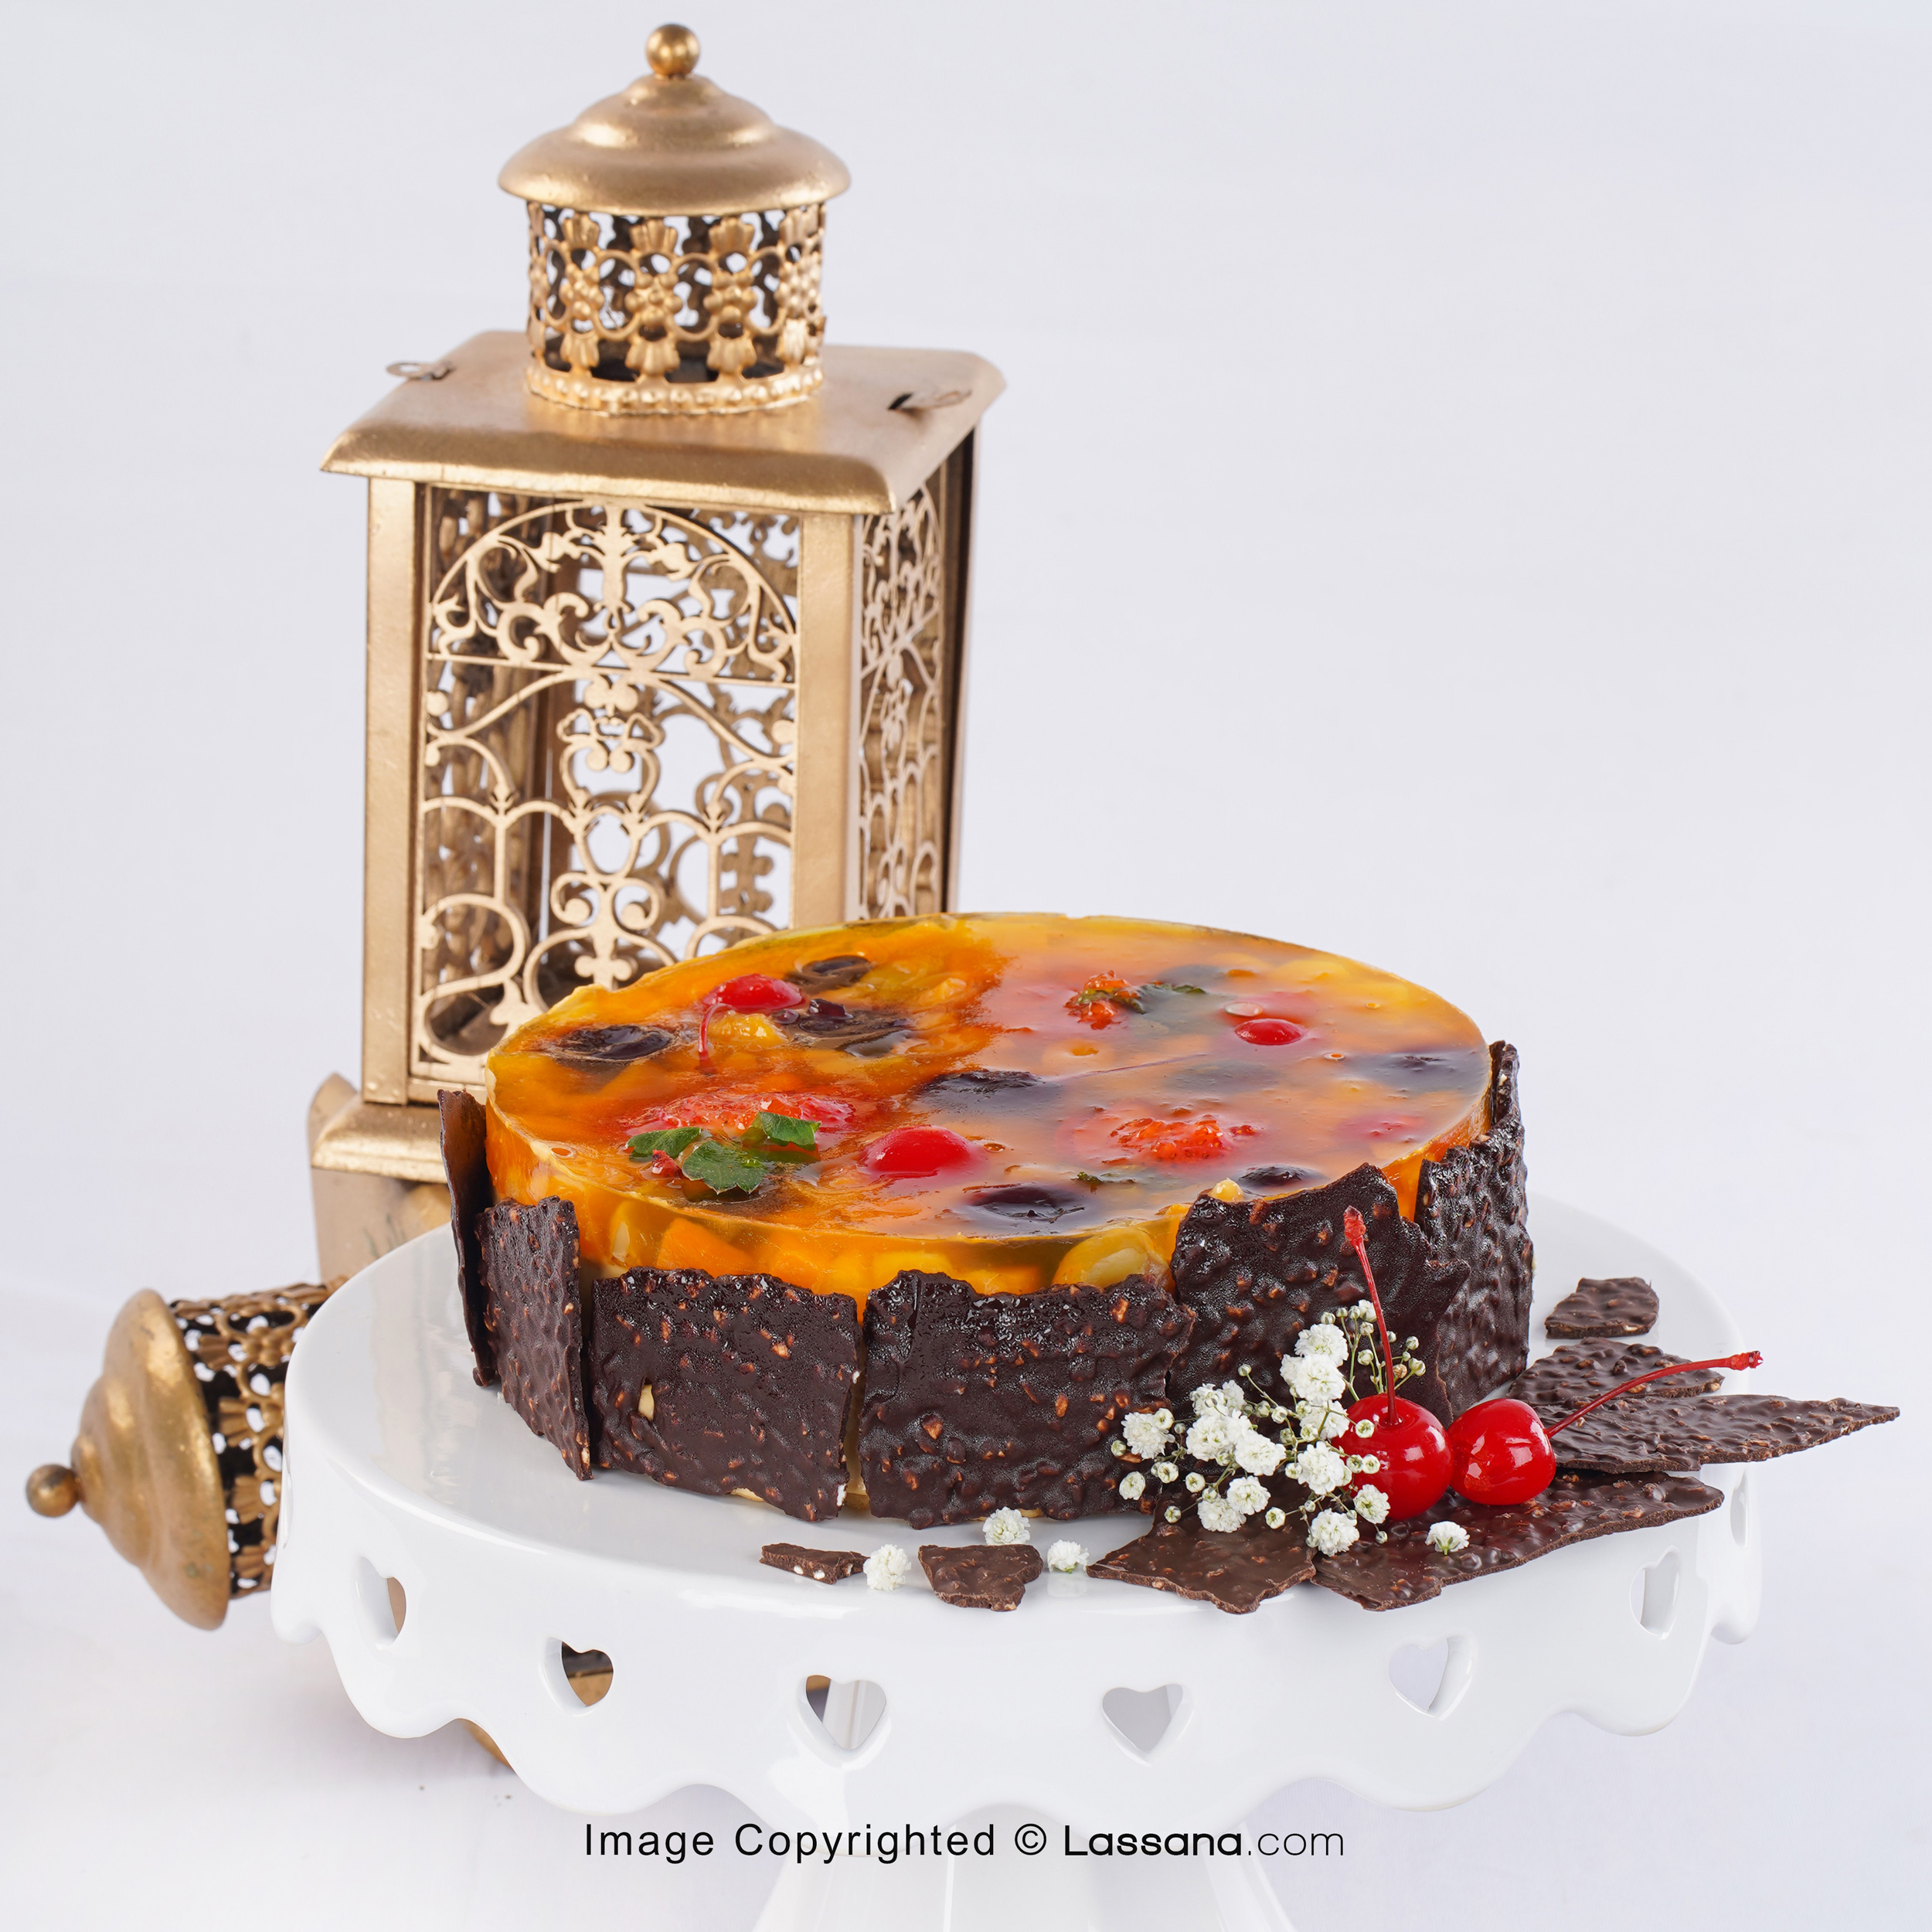 FRUITY JELLO CAKE 1.2KG (2.6Lbs) - Lassana Cakes - in Sri Lanka